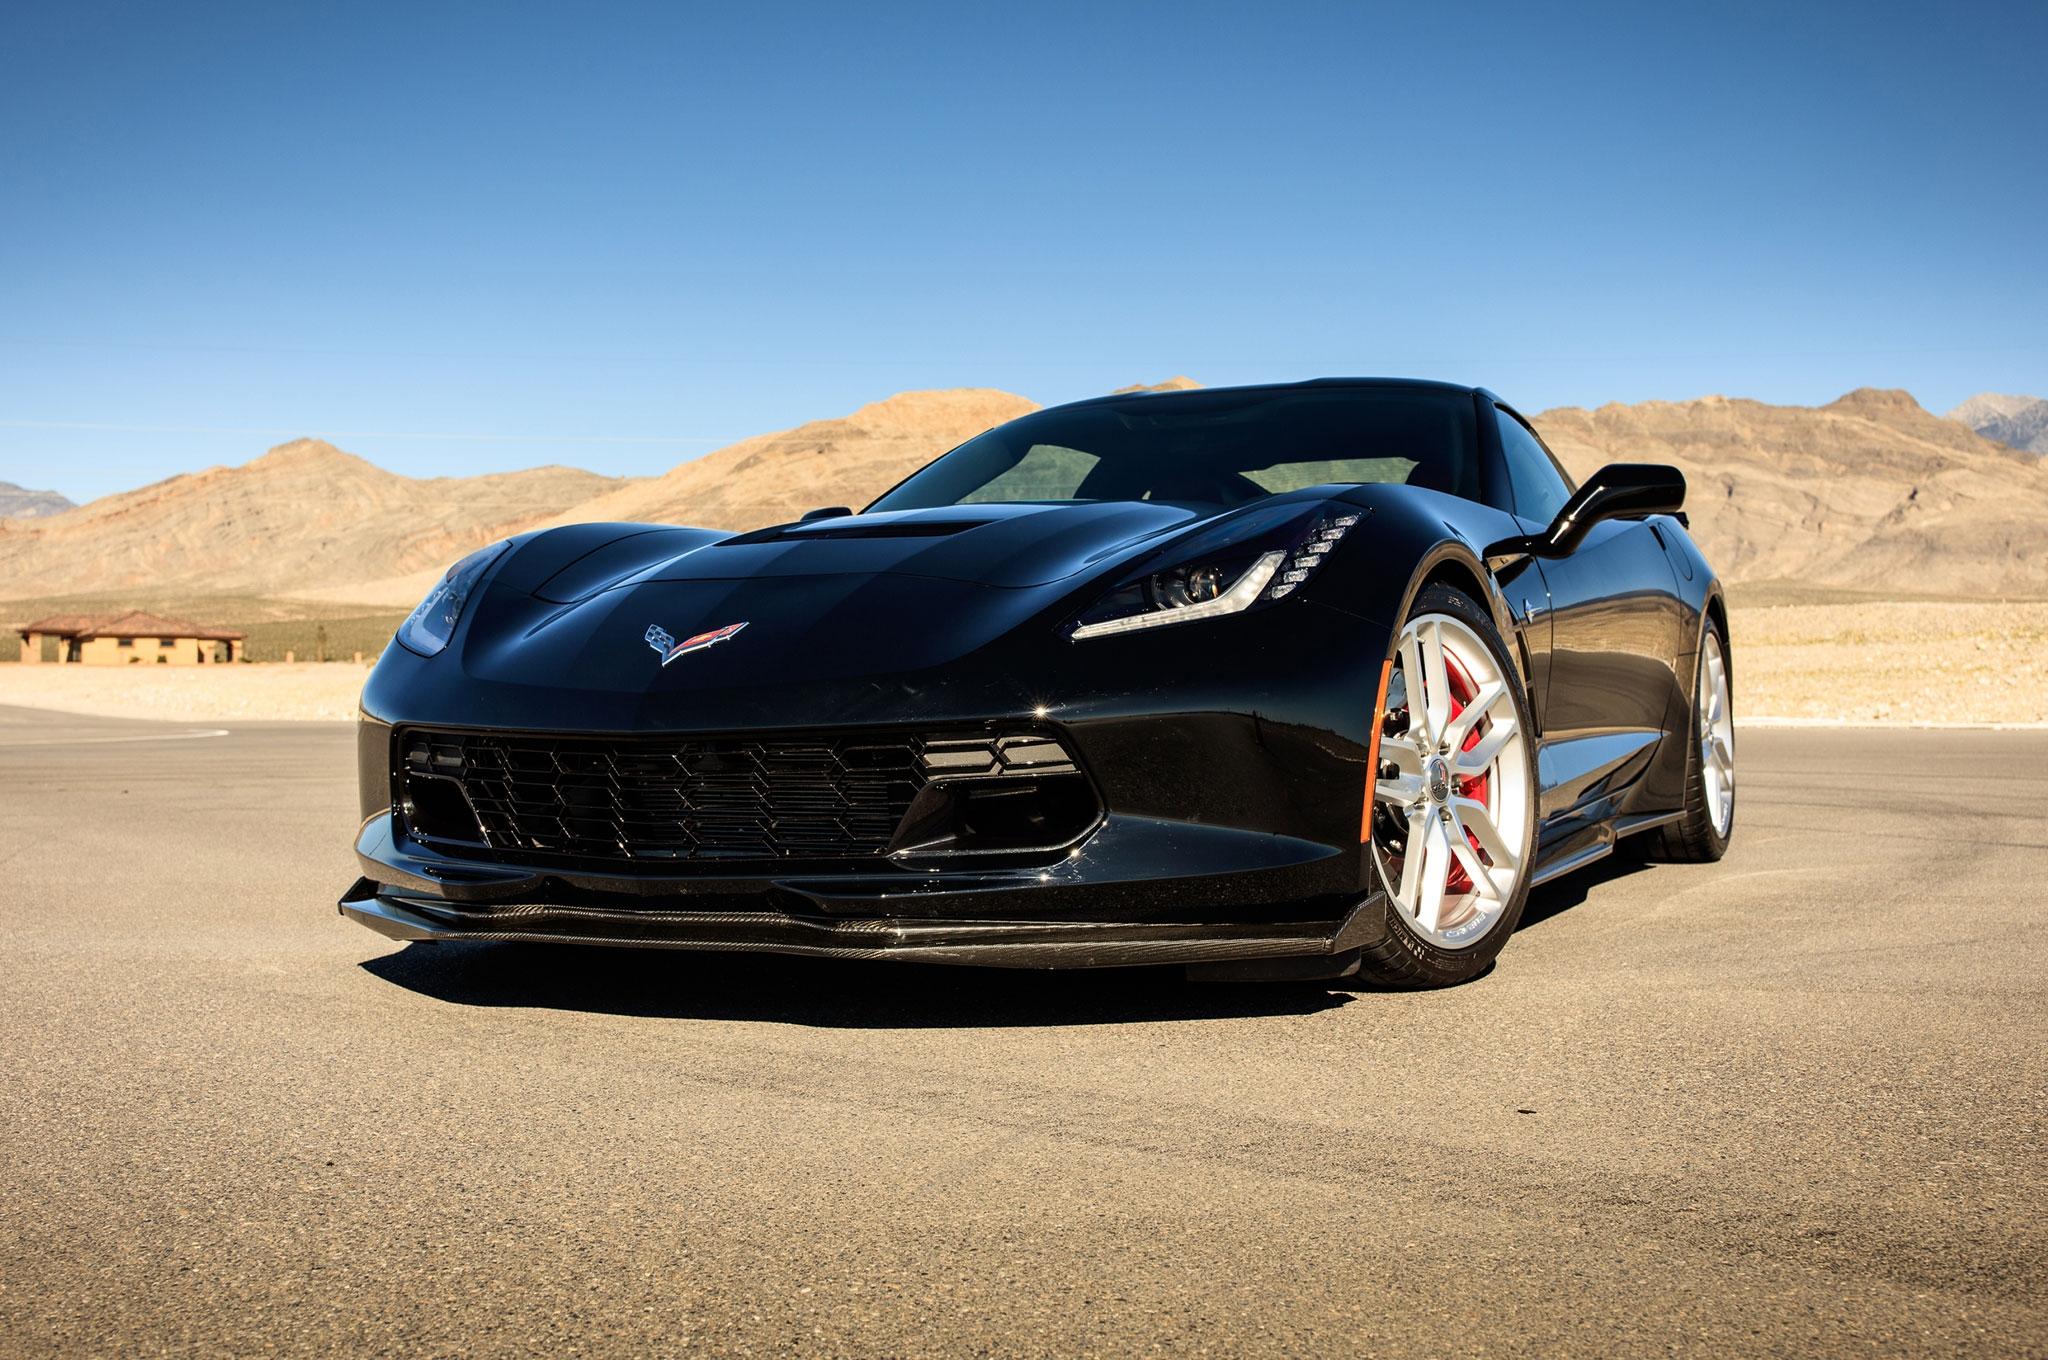 Nocturnal Mirage Images 2016 Chevrolet Corvette Stingray Hd